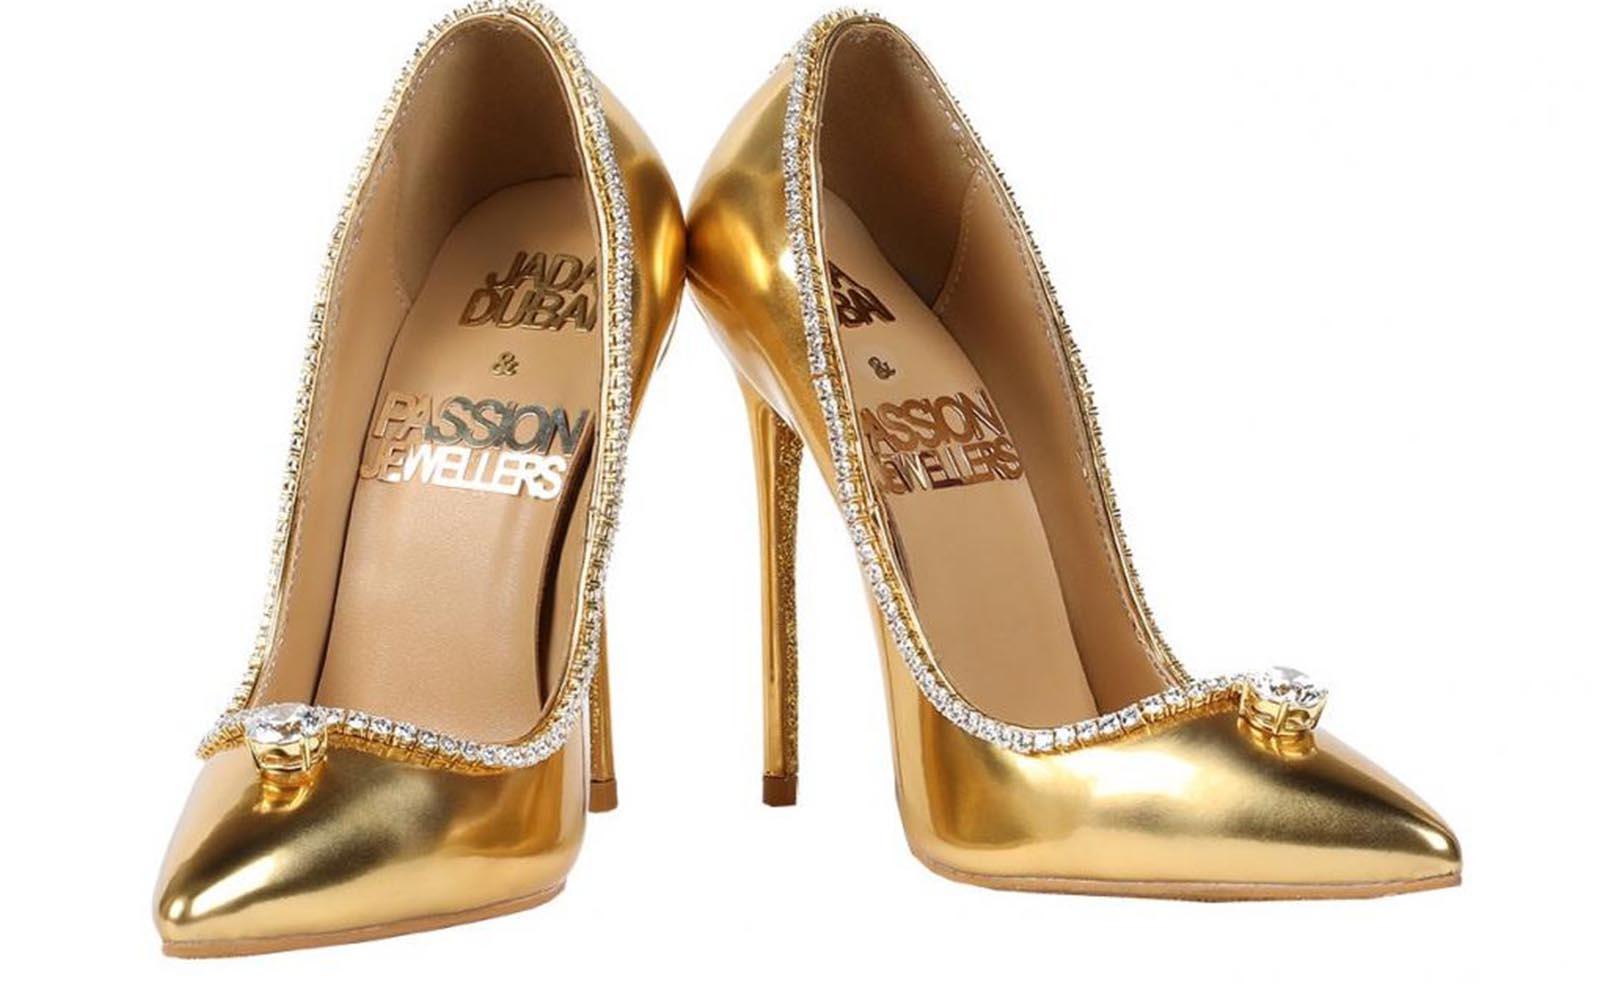 sapatos mais caros do mundo-passion diamond-ouro-03-boatshopping